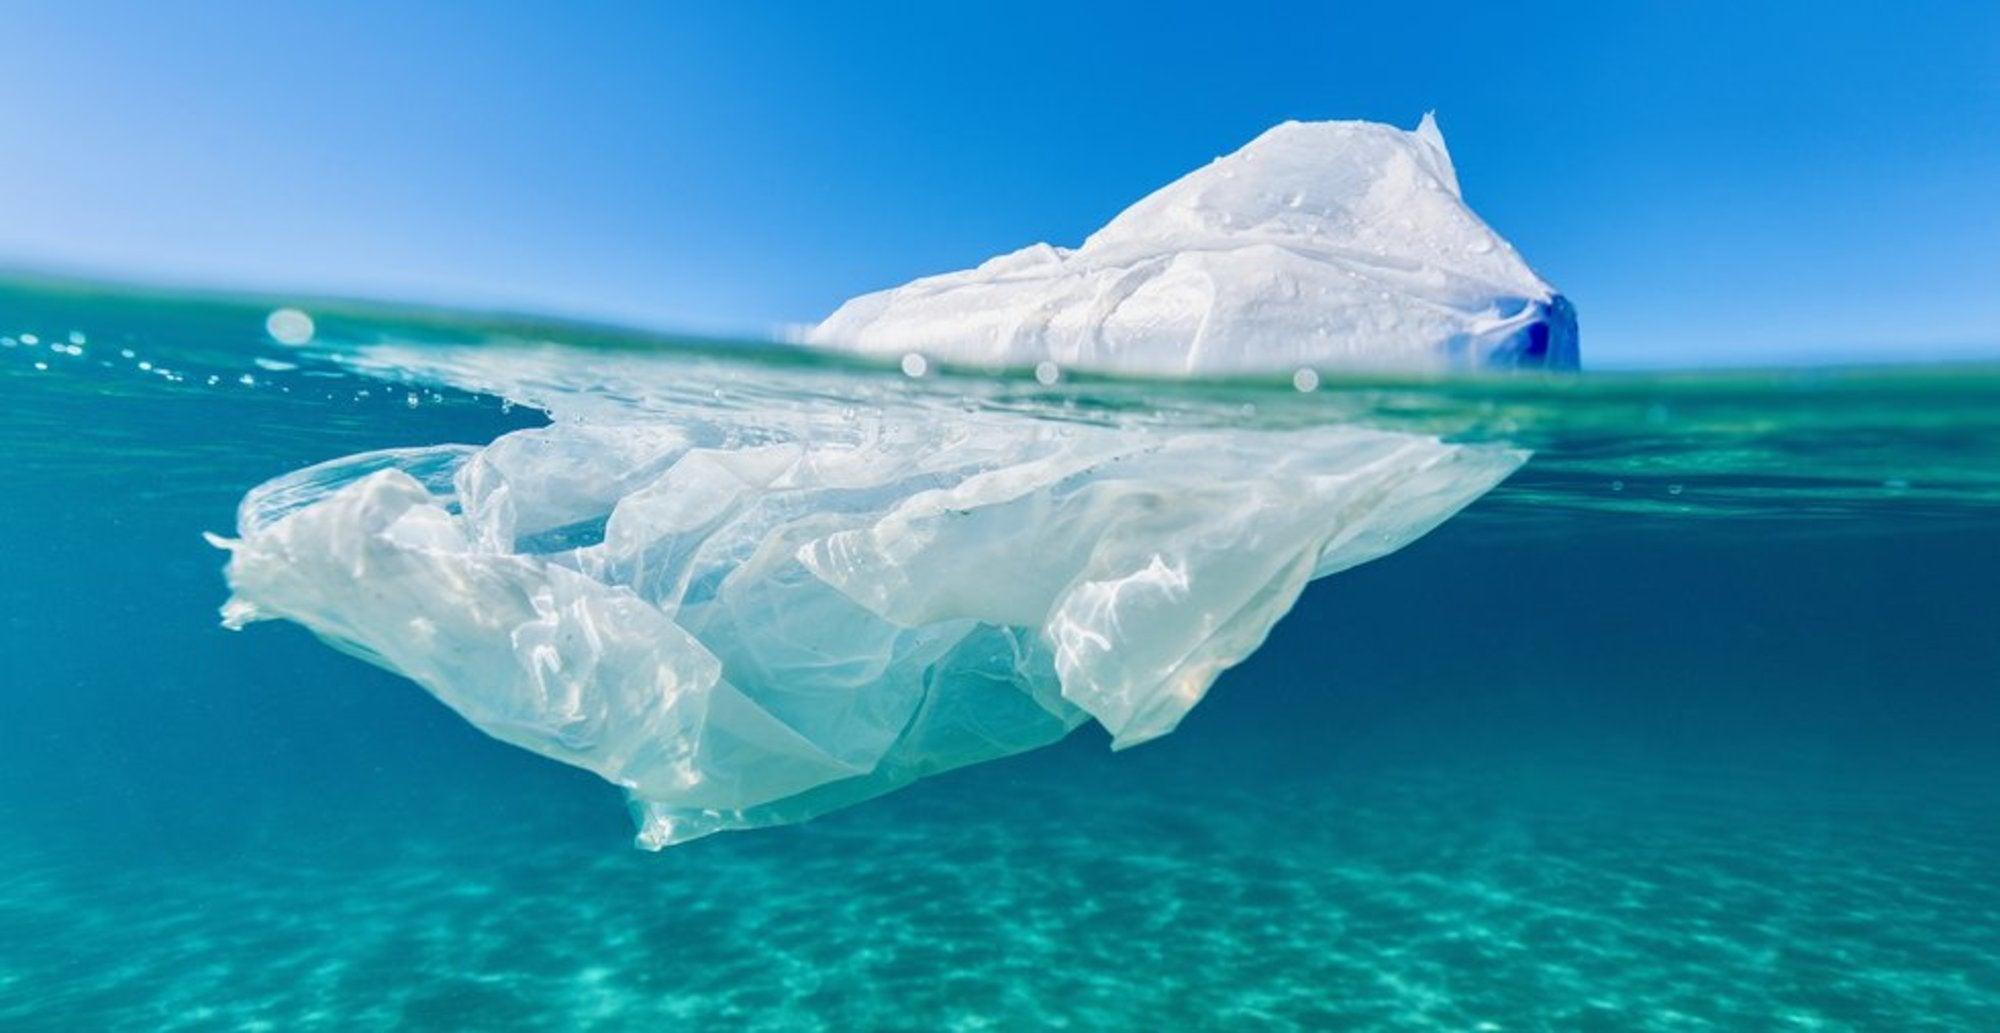 🛍 Zero waste: onlajn-kaľkuljator dopomože porahuvaty kiľkisť plastyku, ščo spožyvaje ljudyna